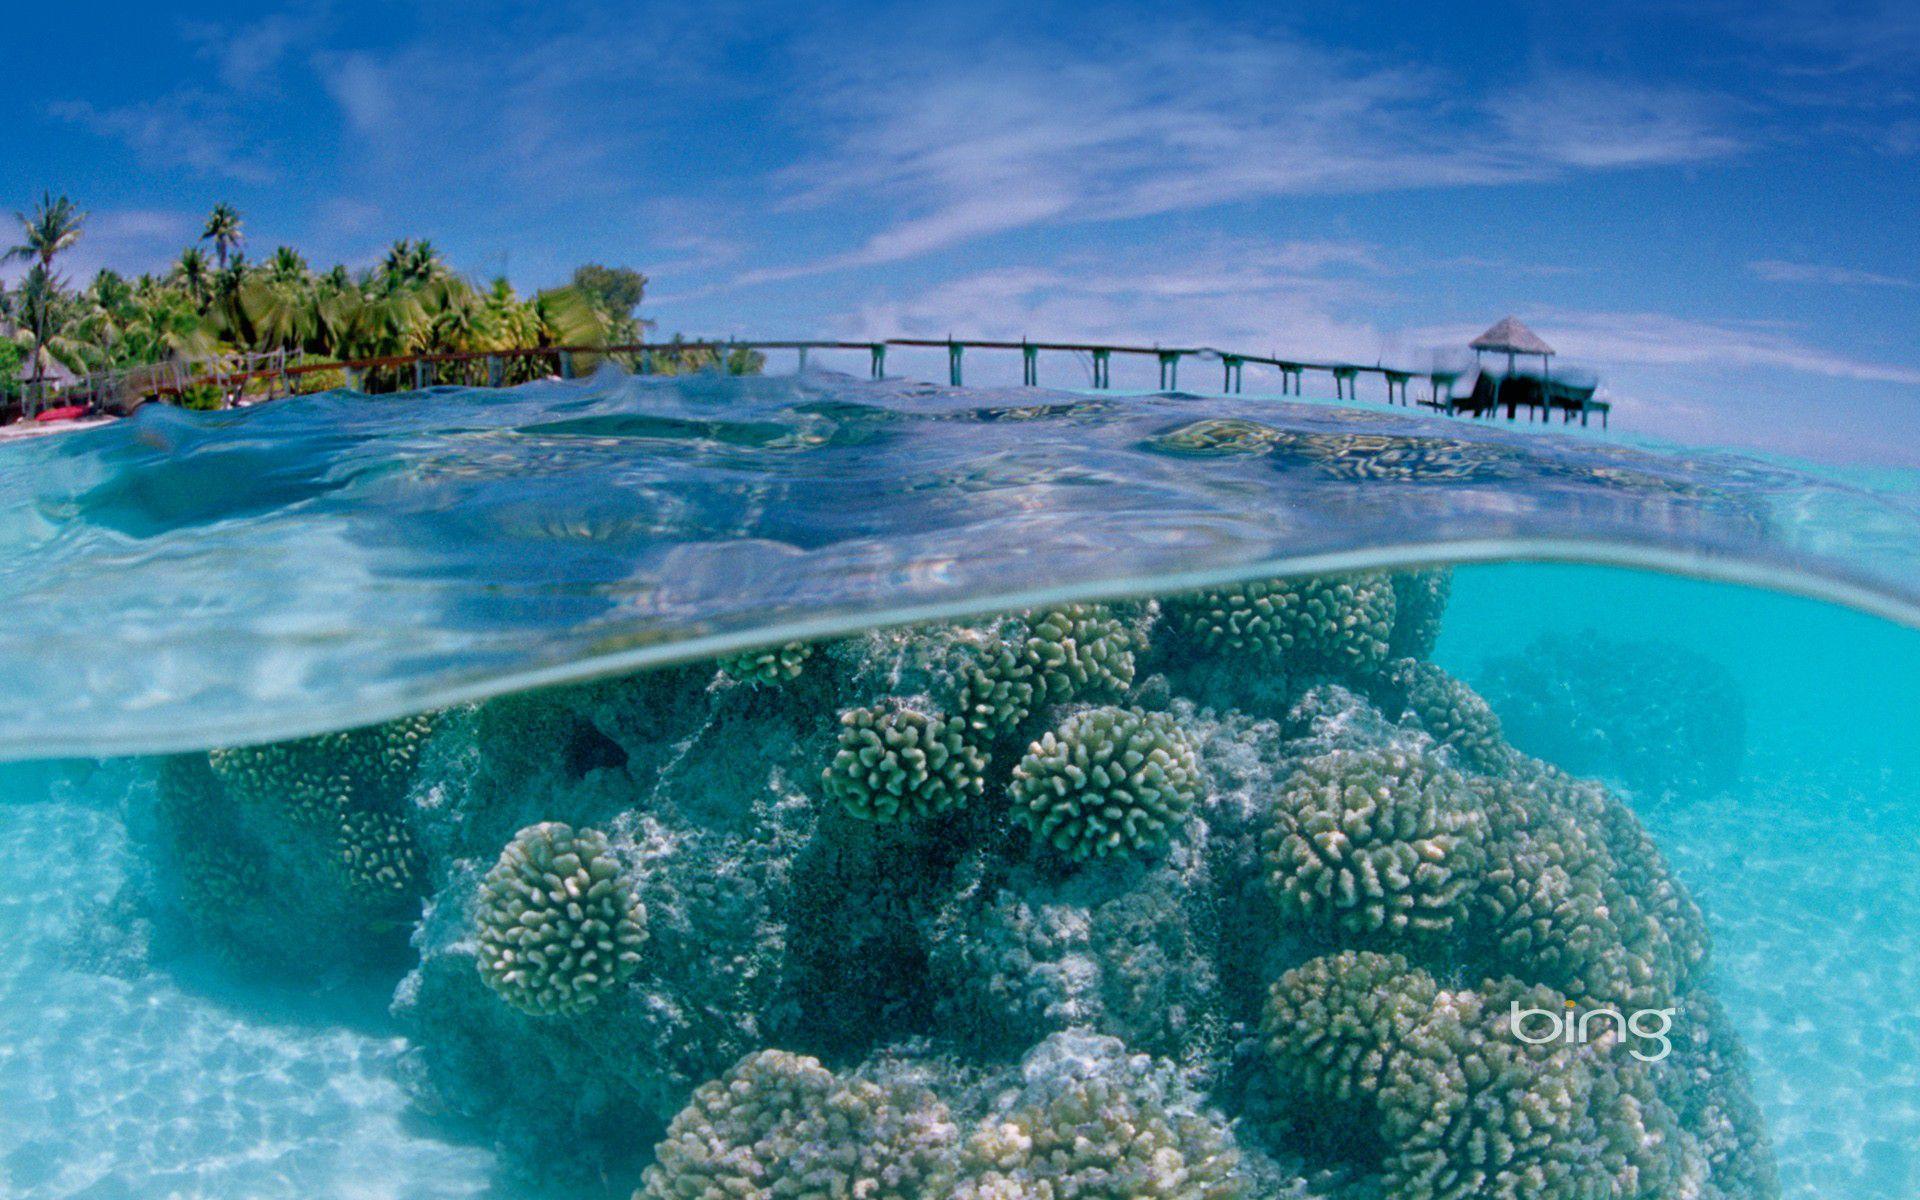 Fakarava Atoll Underwater 1920x1200 Awaa Landscape Wallpapers Paisajes Fondos De Pantalla Naturaleza